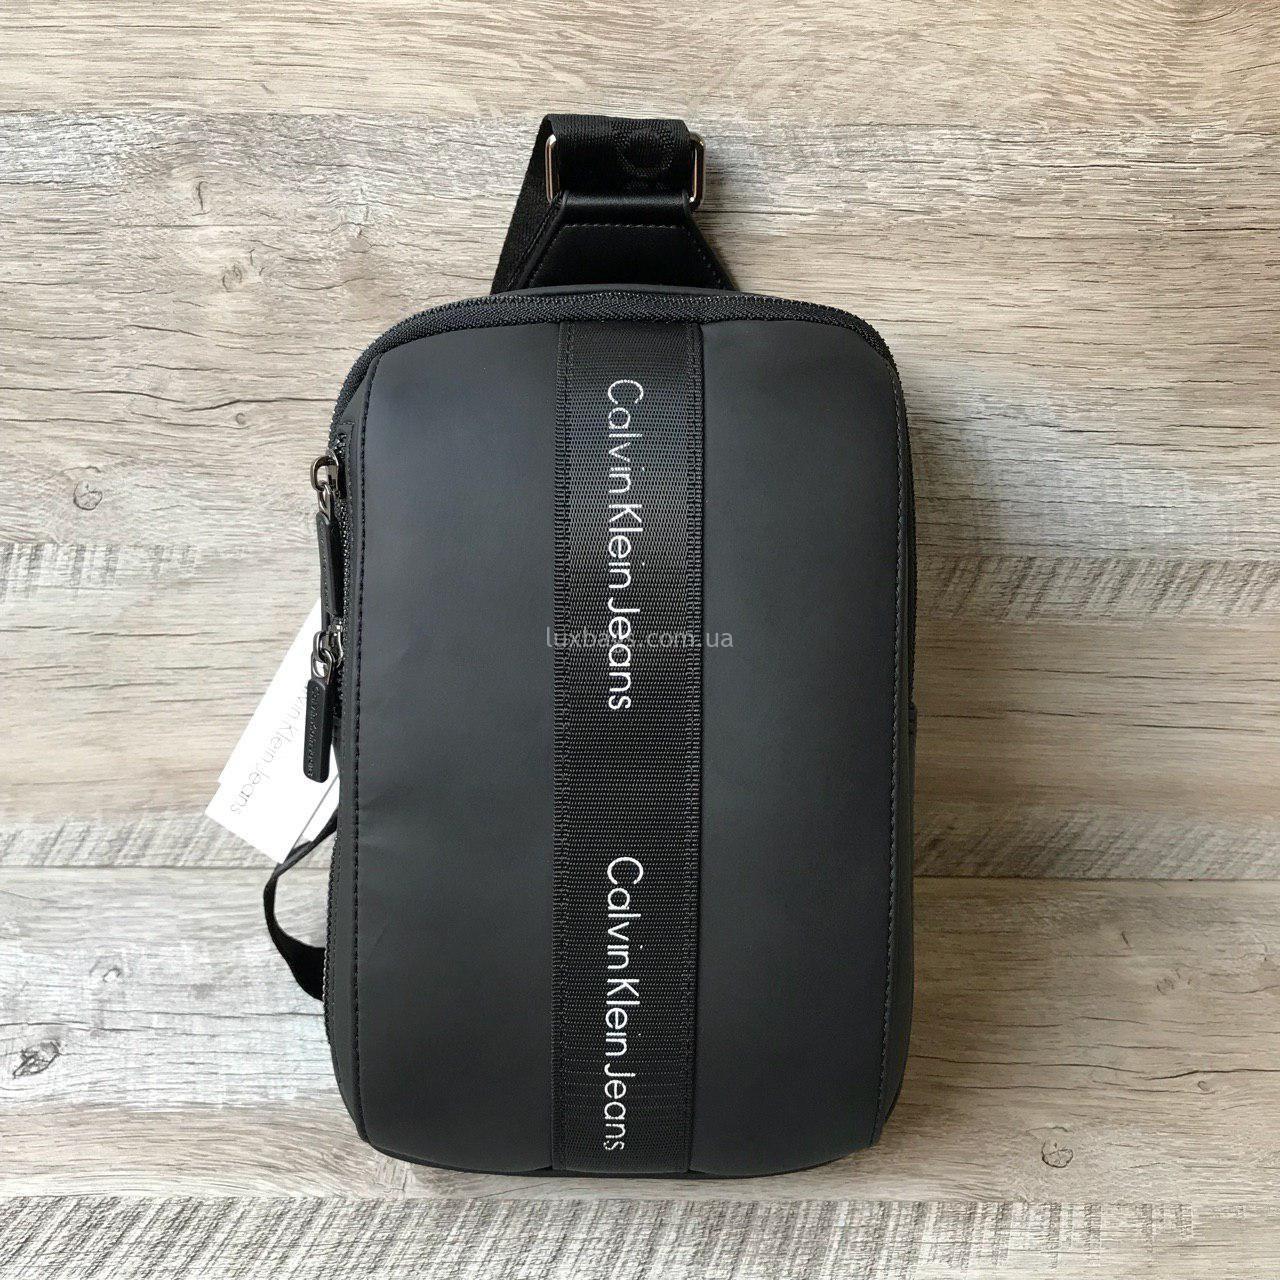 ede4d506 Мужская сумка бананка-слинг Calvin Klein Купить Недорого   lux-bags